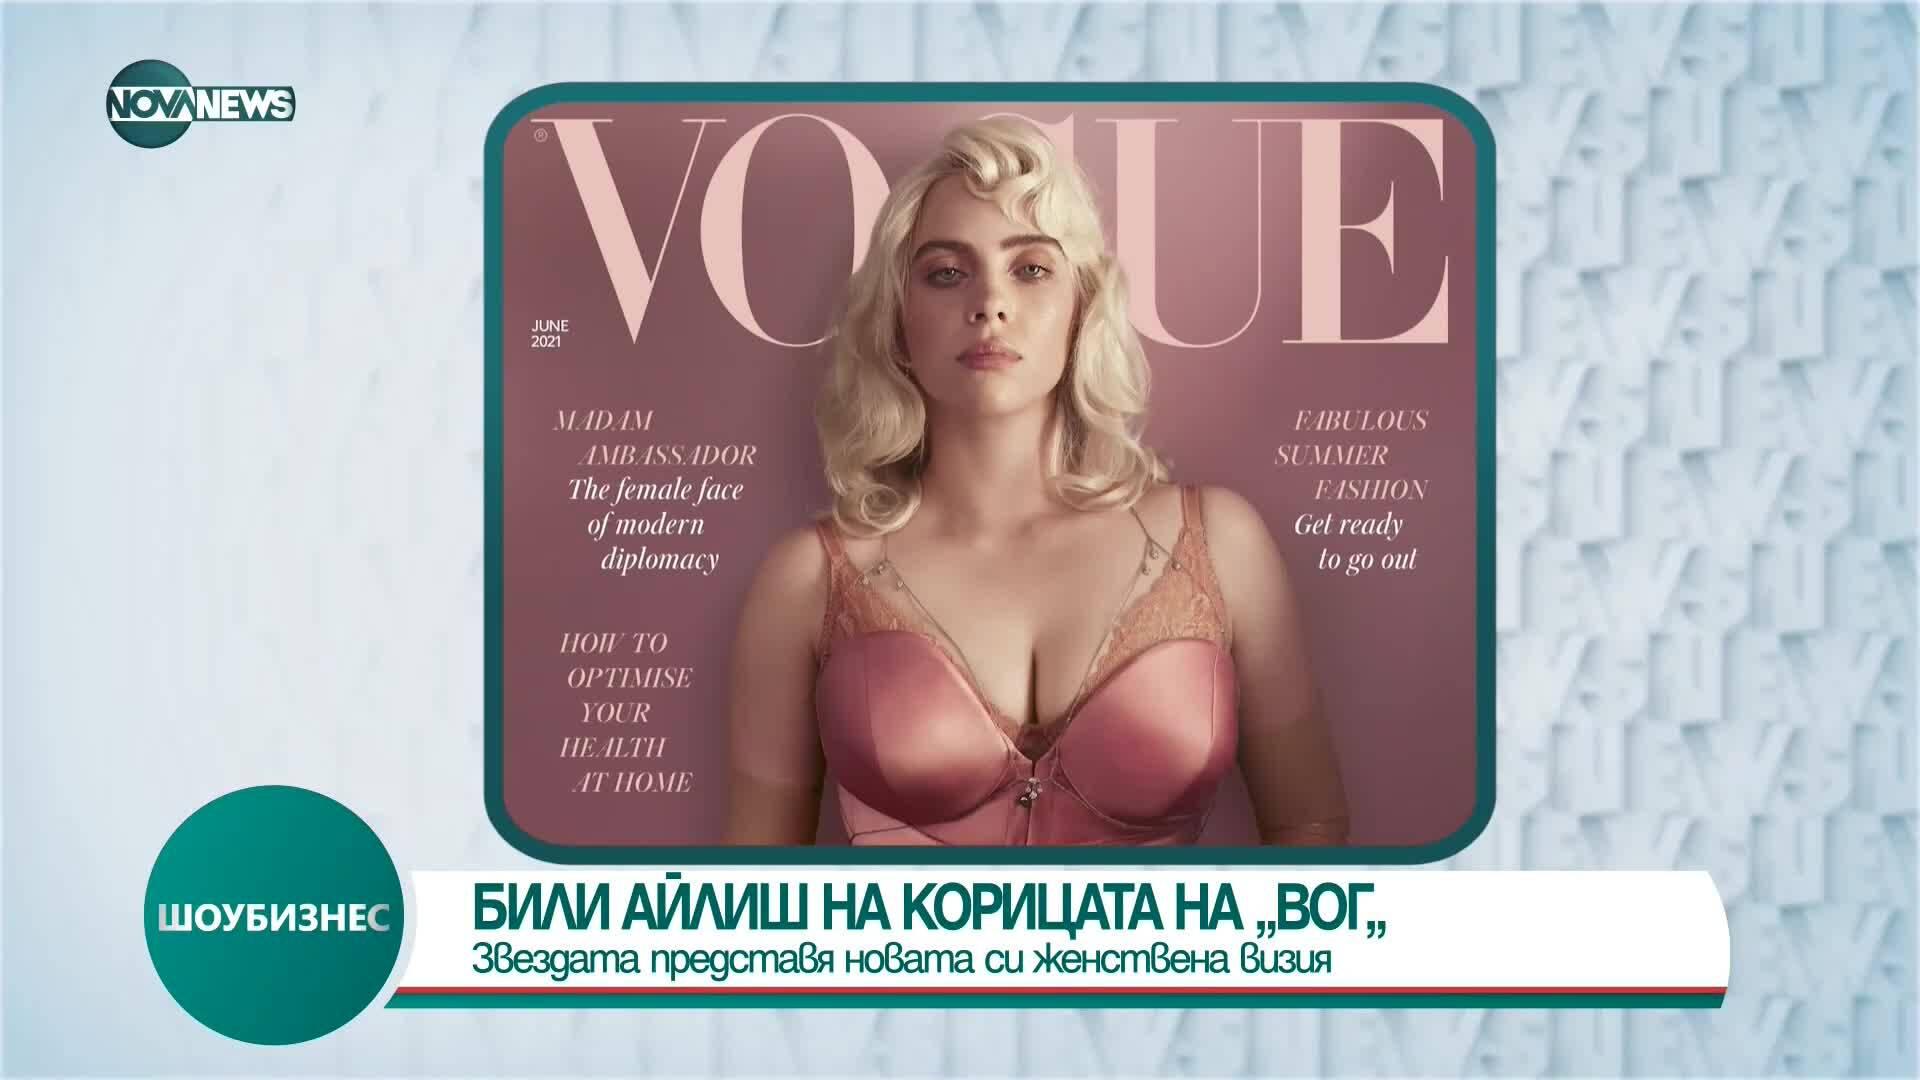 Били Айлиш позира за Vogue с впечатляваща нова визия